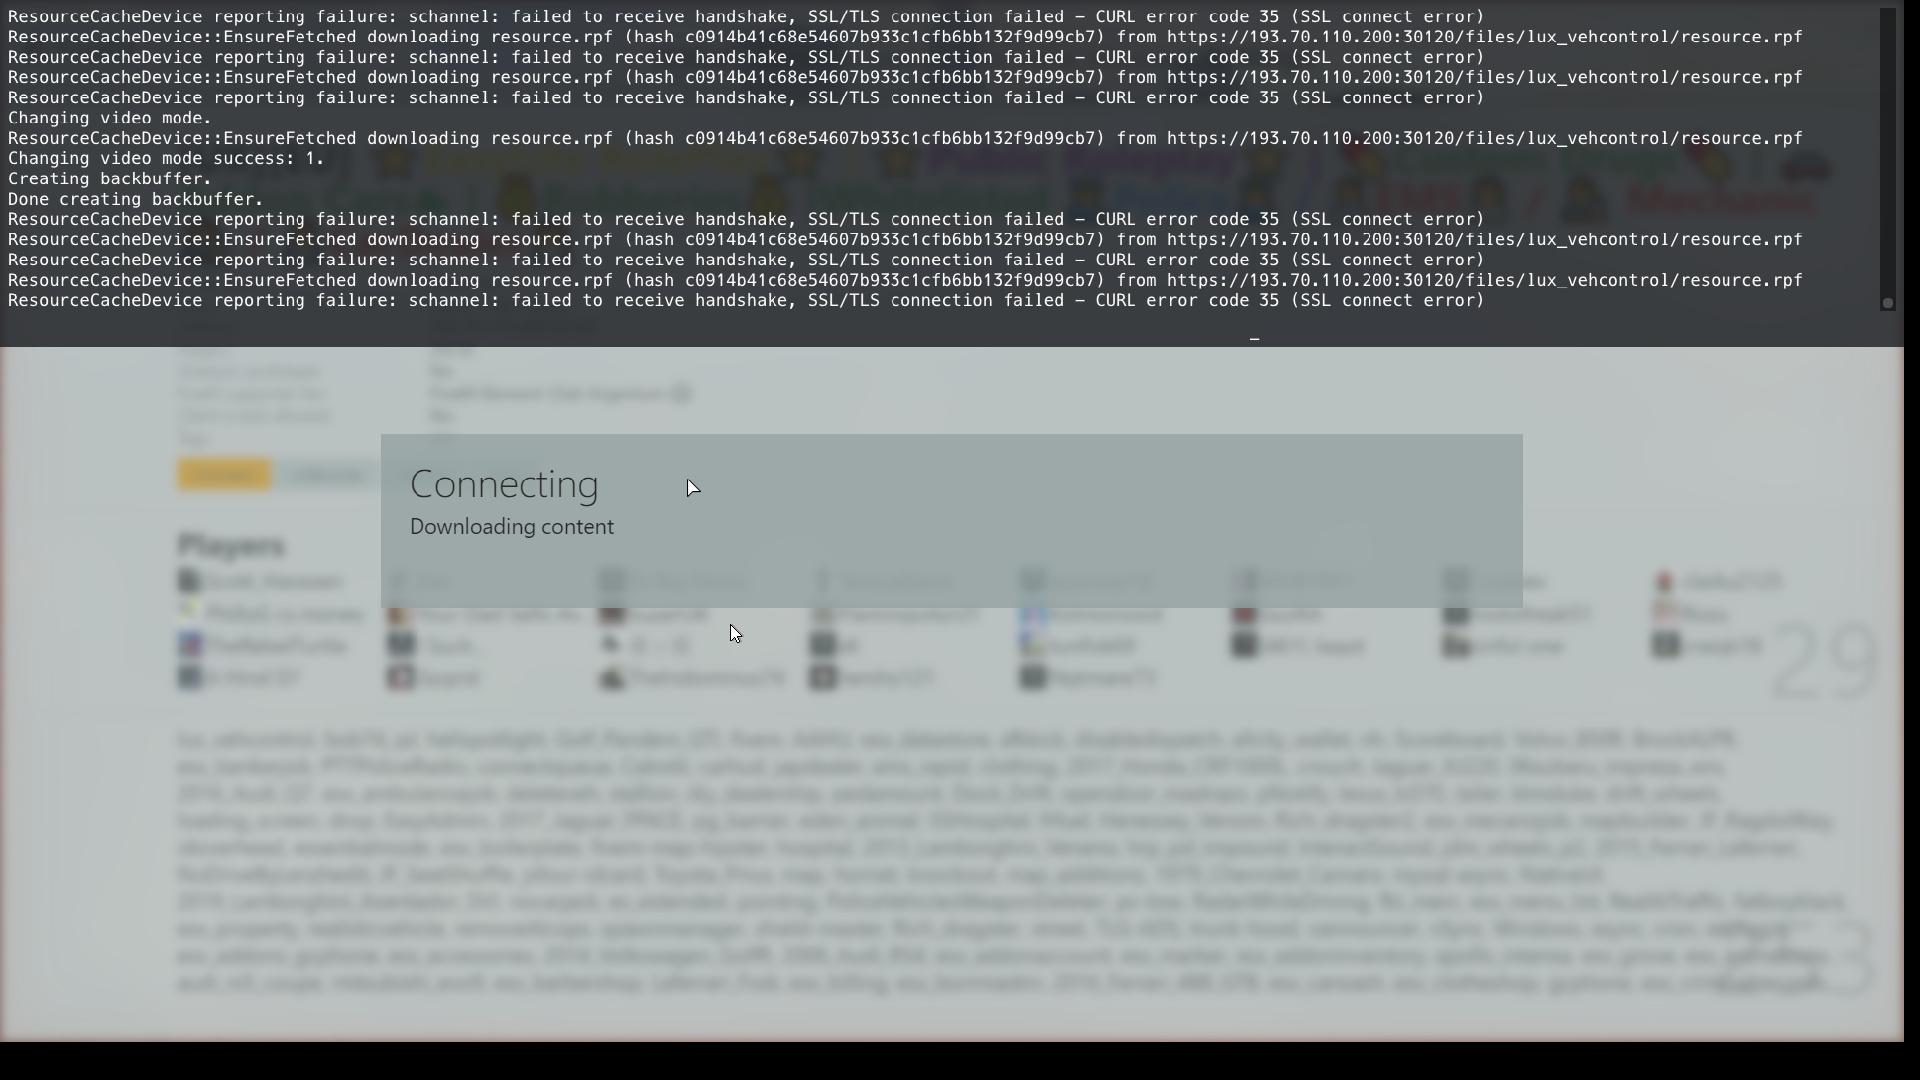 CURl error code 35 (SSL connect error) - Technical Support